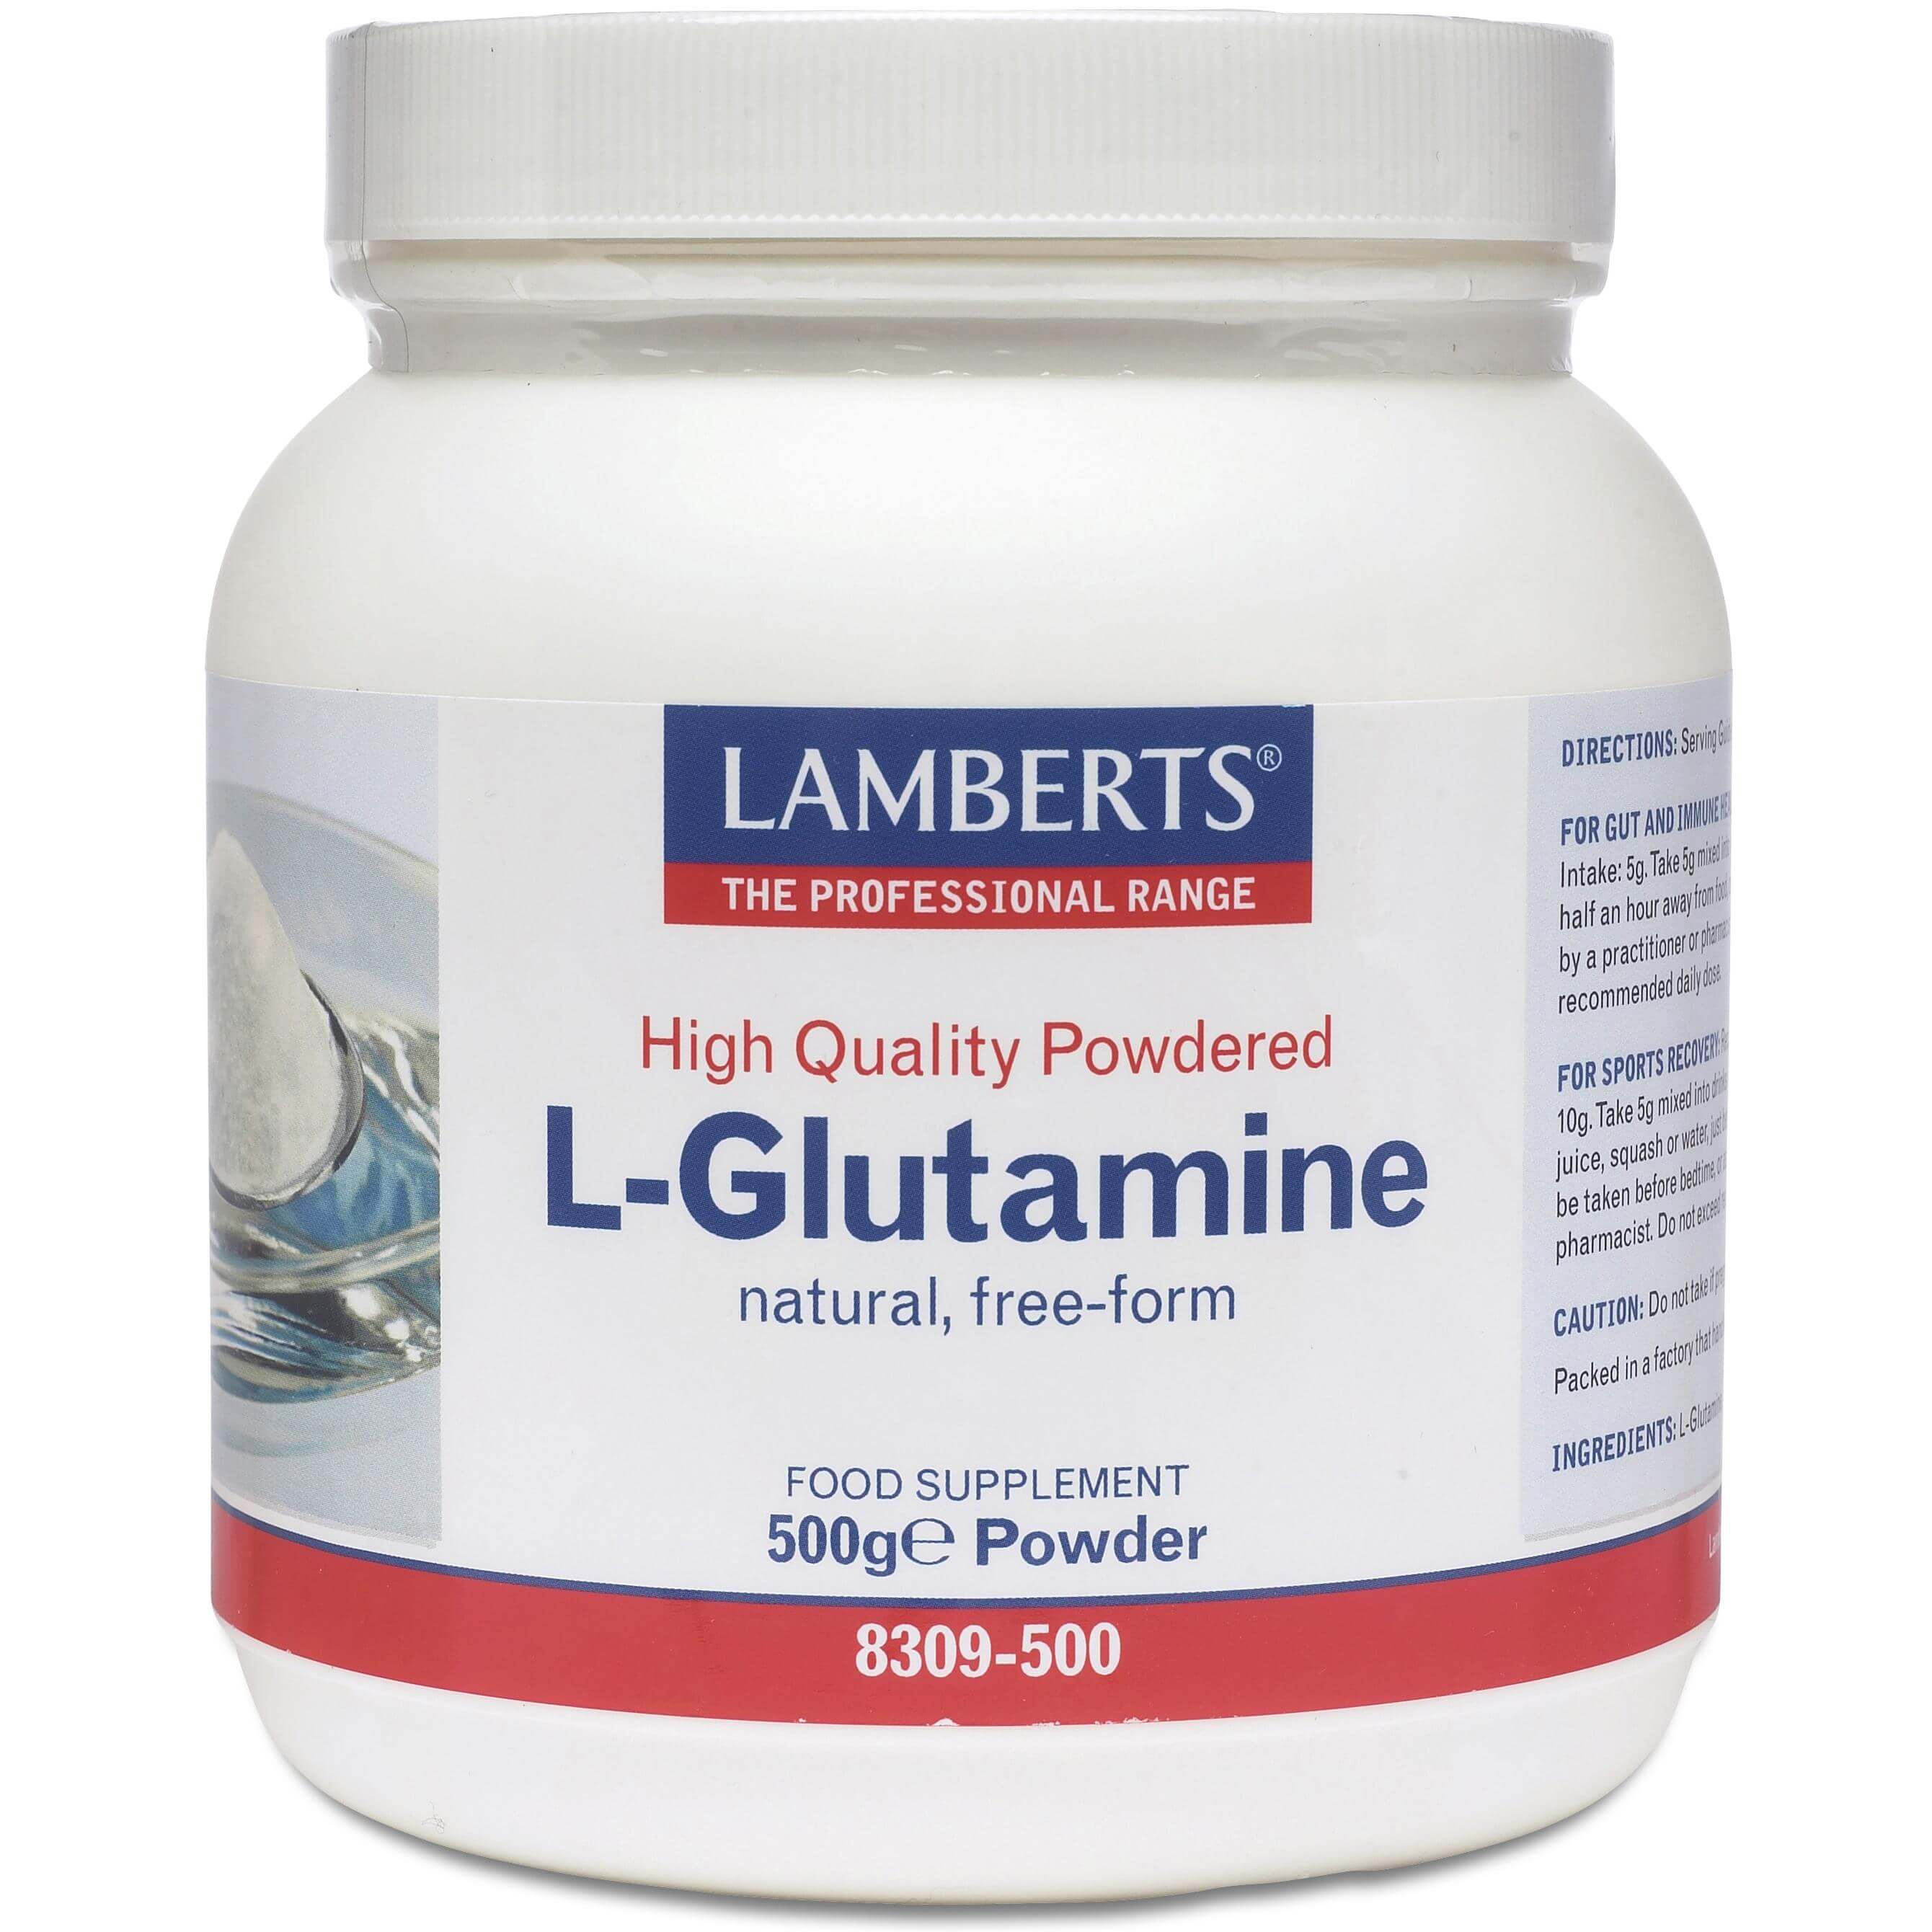 Lamberts L-Glutamine Powder Αμινοξύ για τη Καλή Λειτουργία του Εντέρου σε Σκόνη 500gr